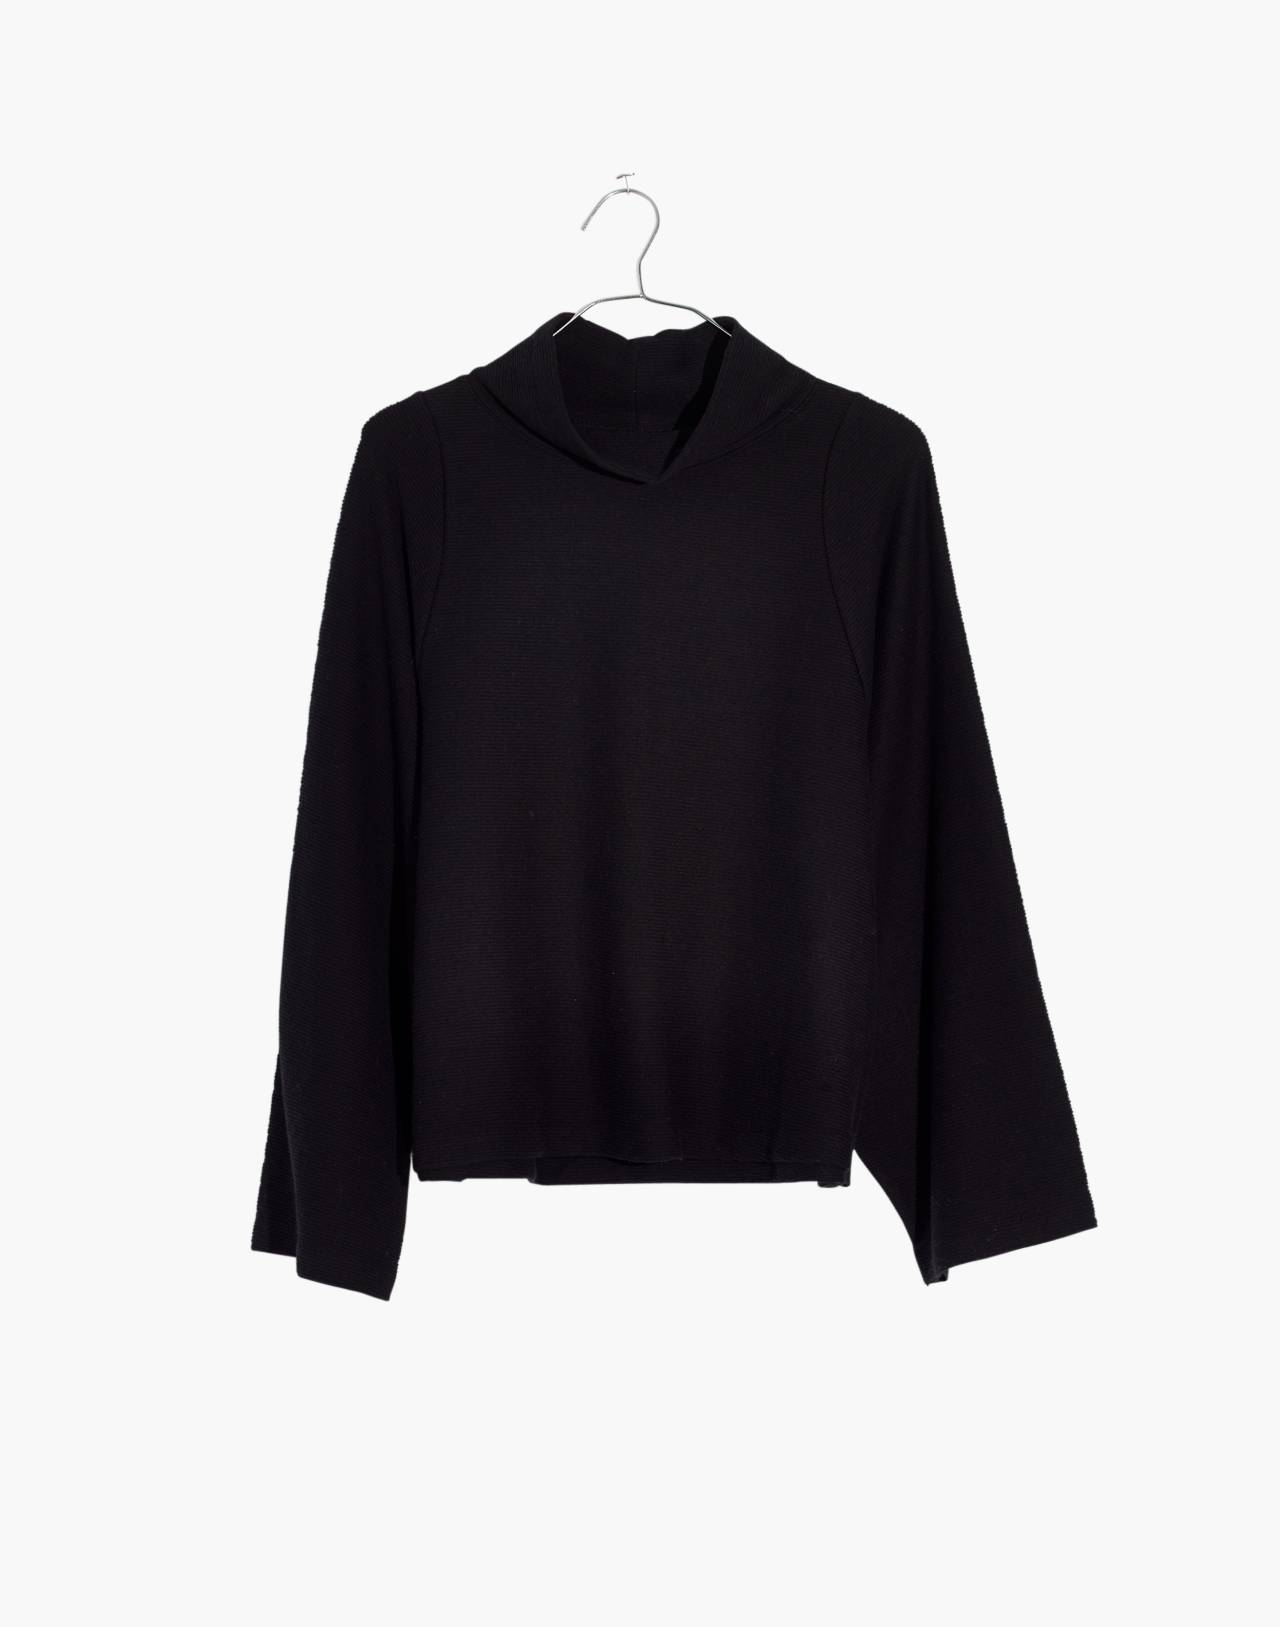 Texture & Thread Long-Sleeve Mockneck Top in true black image 1